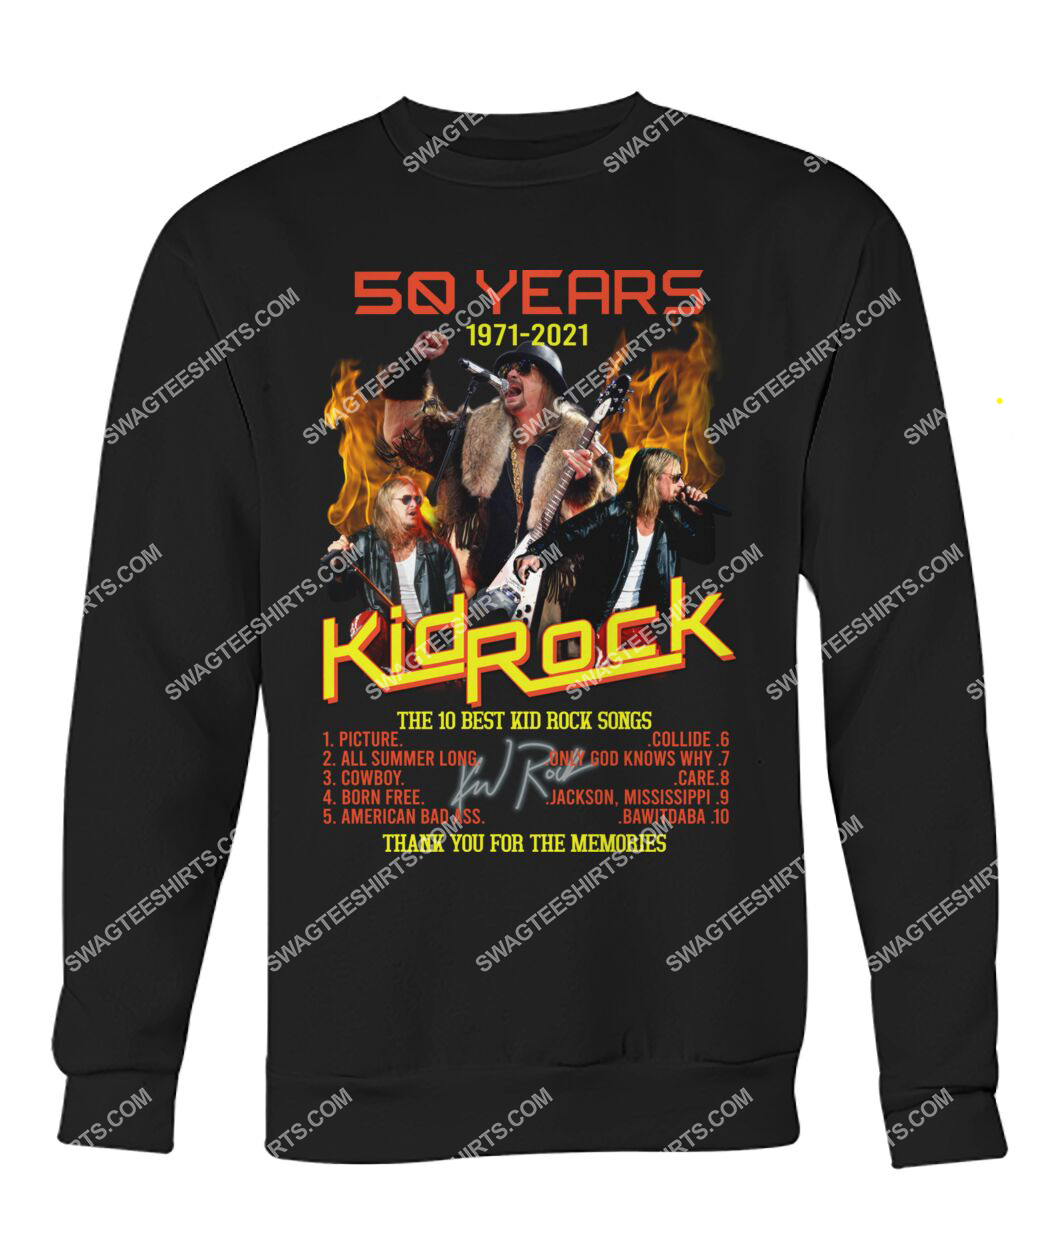 vintage kid rock 50 years thank you for memories signature sweatshirt 1